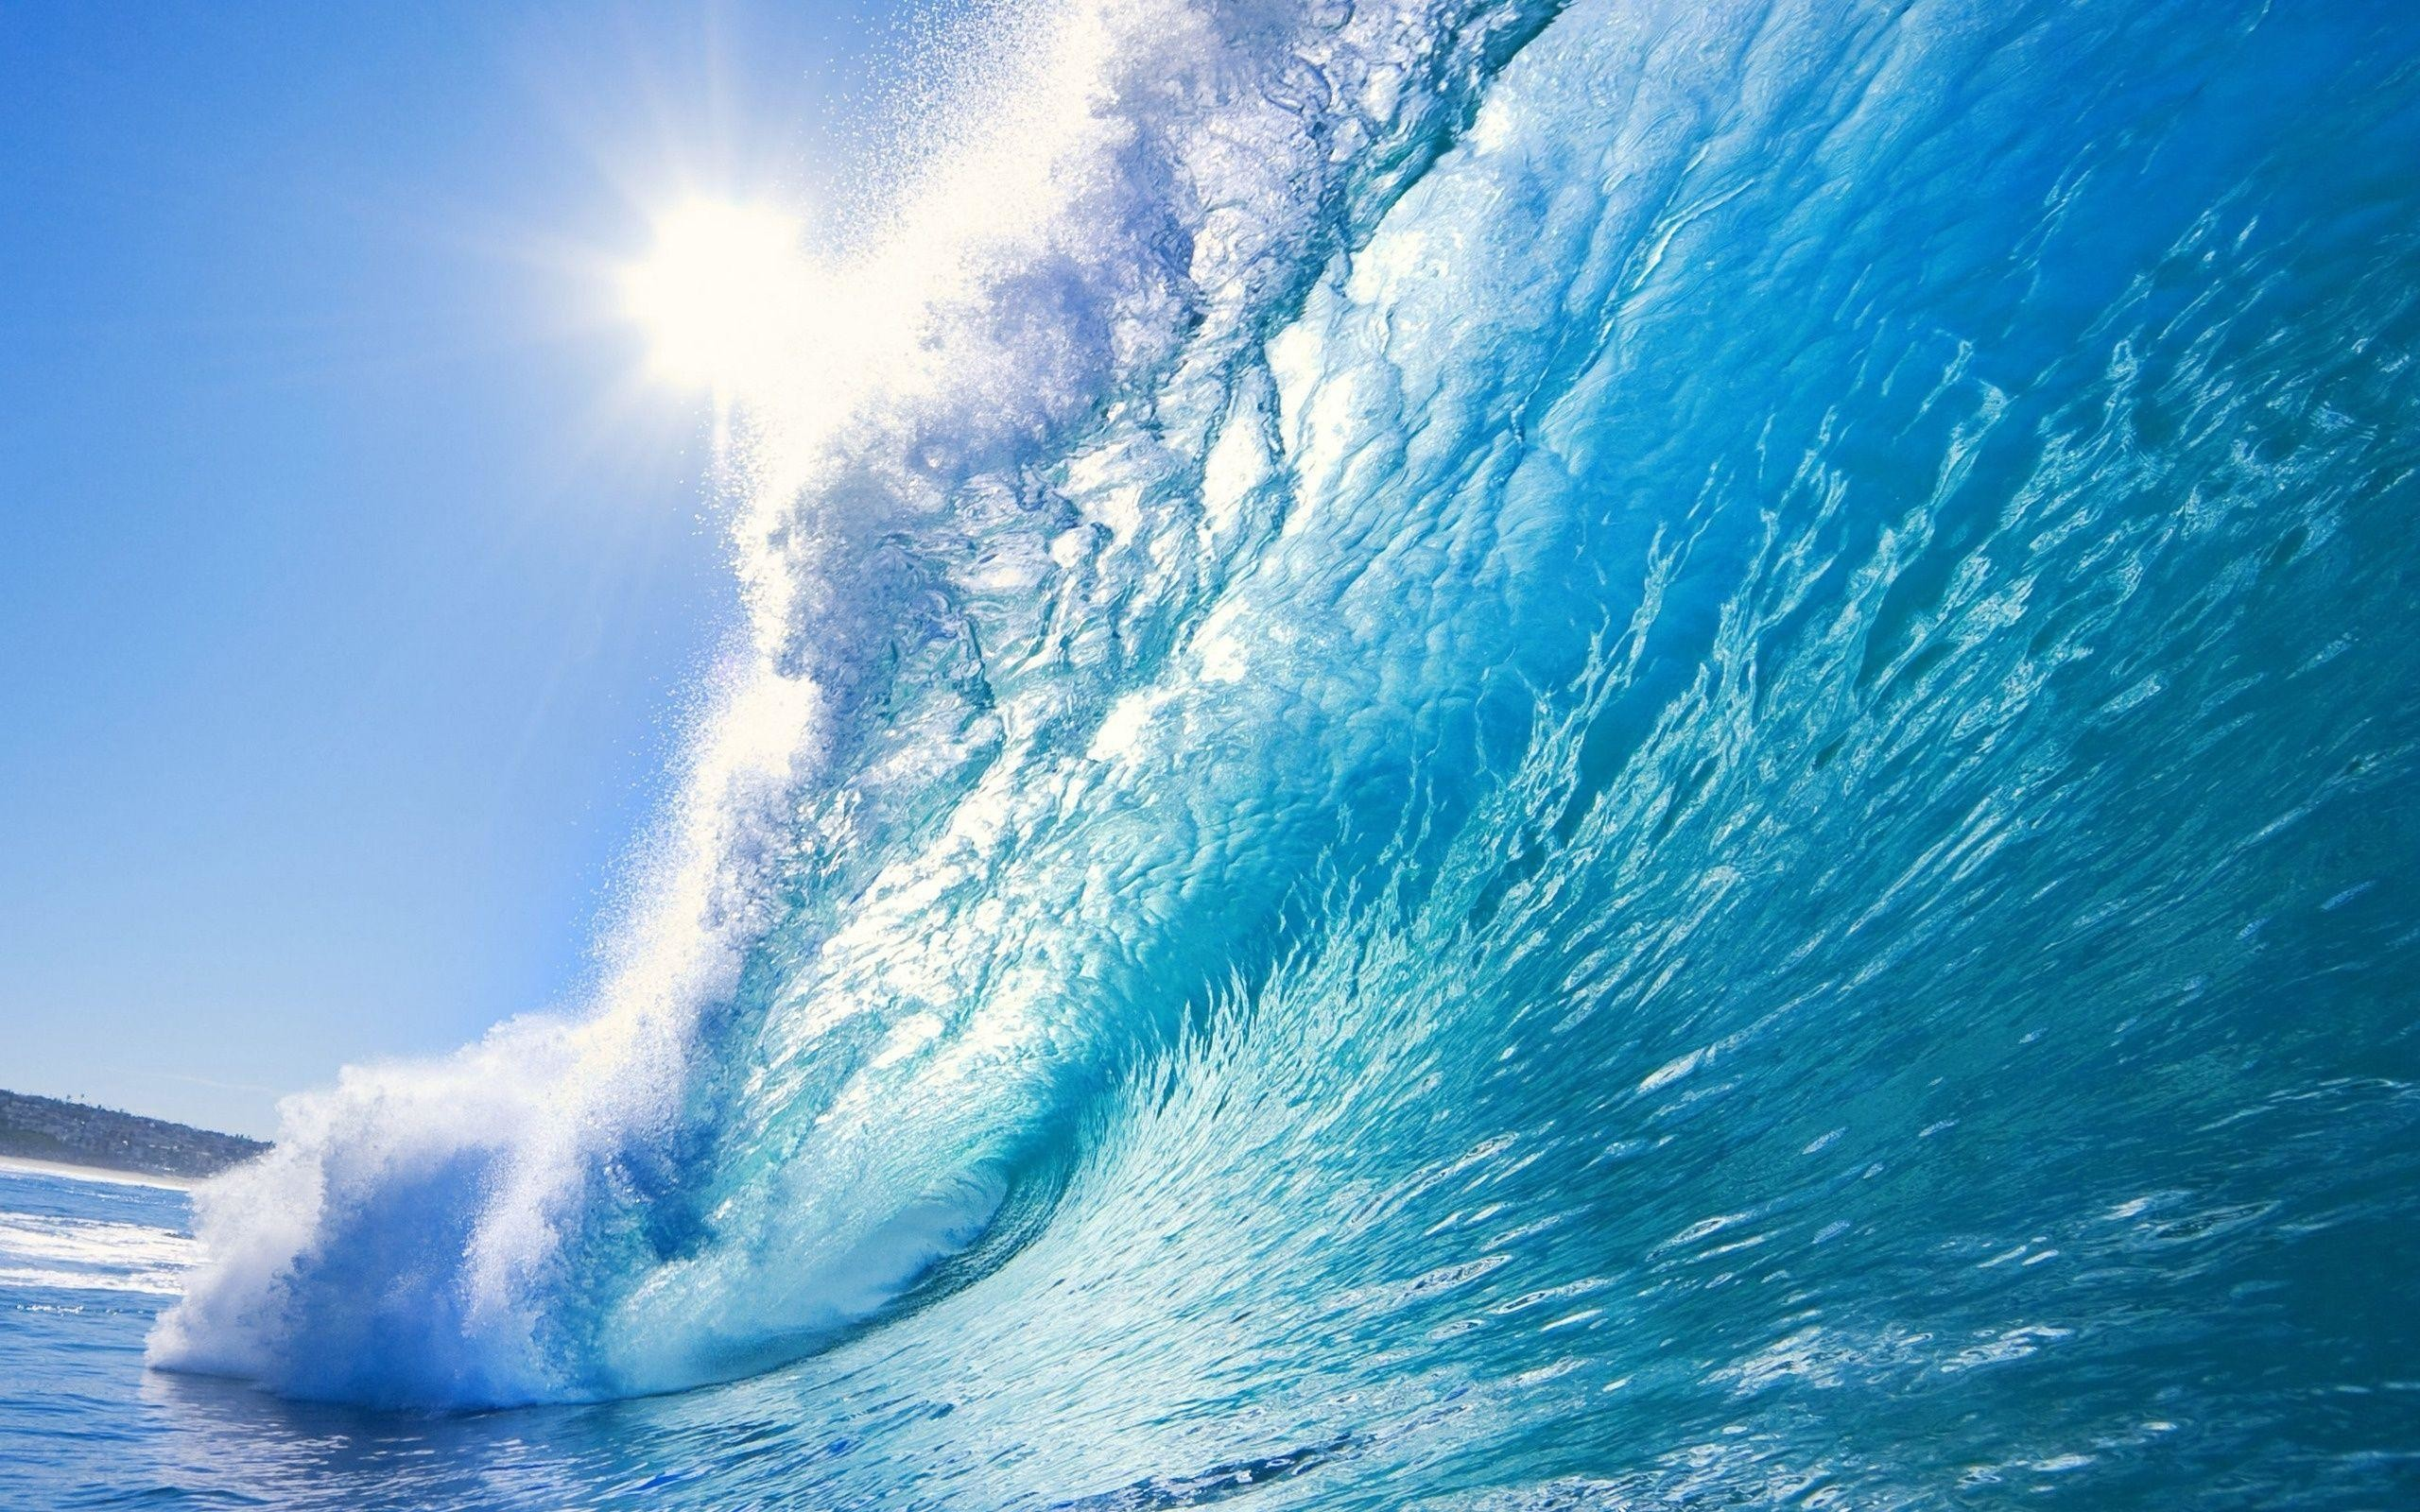 ocean background pictures  u00b7 u2460 wallpapertag